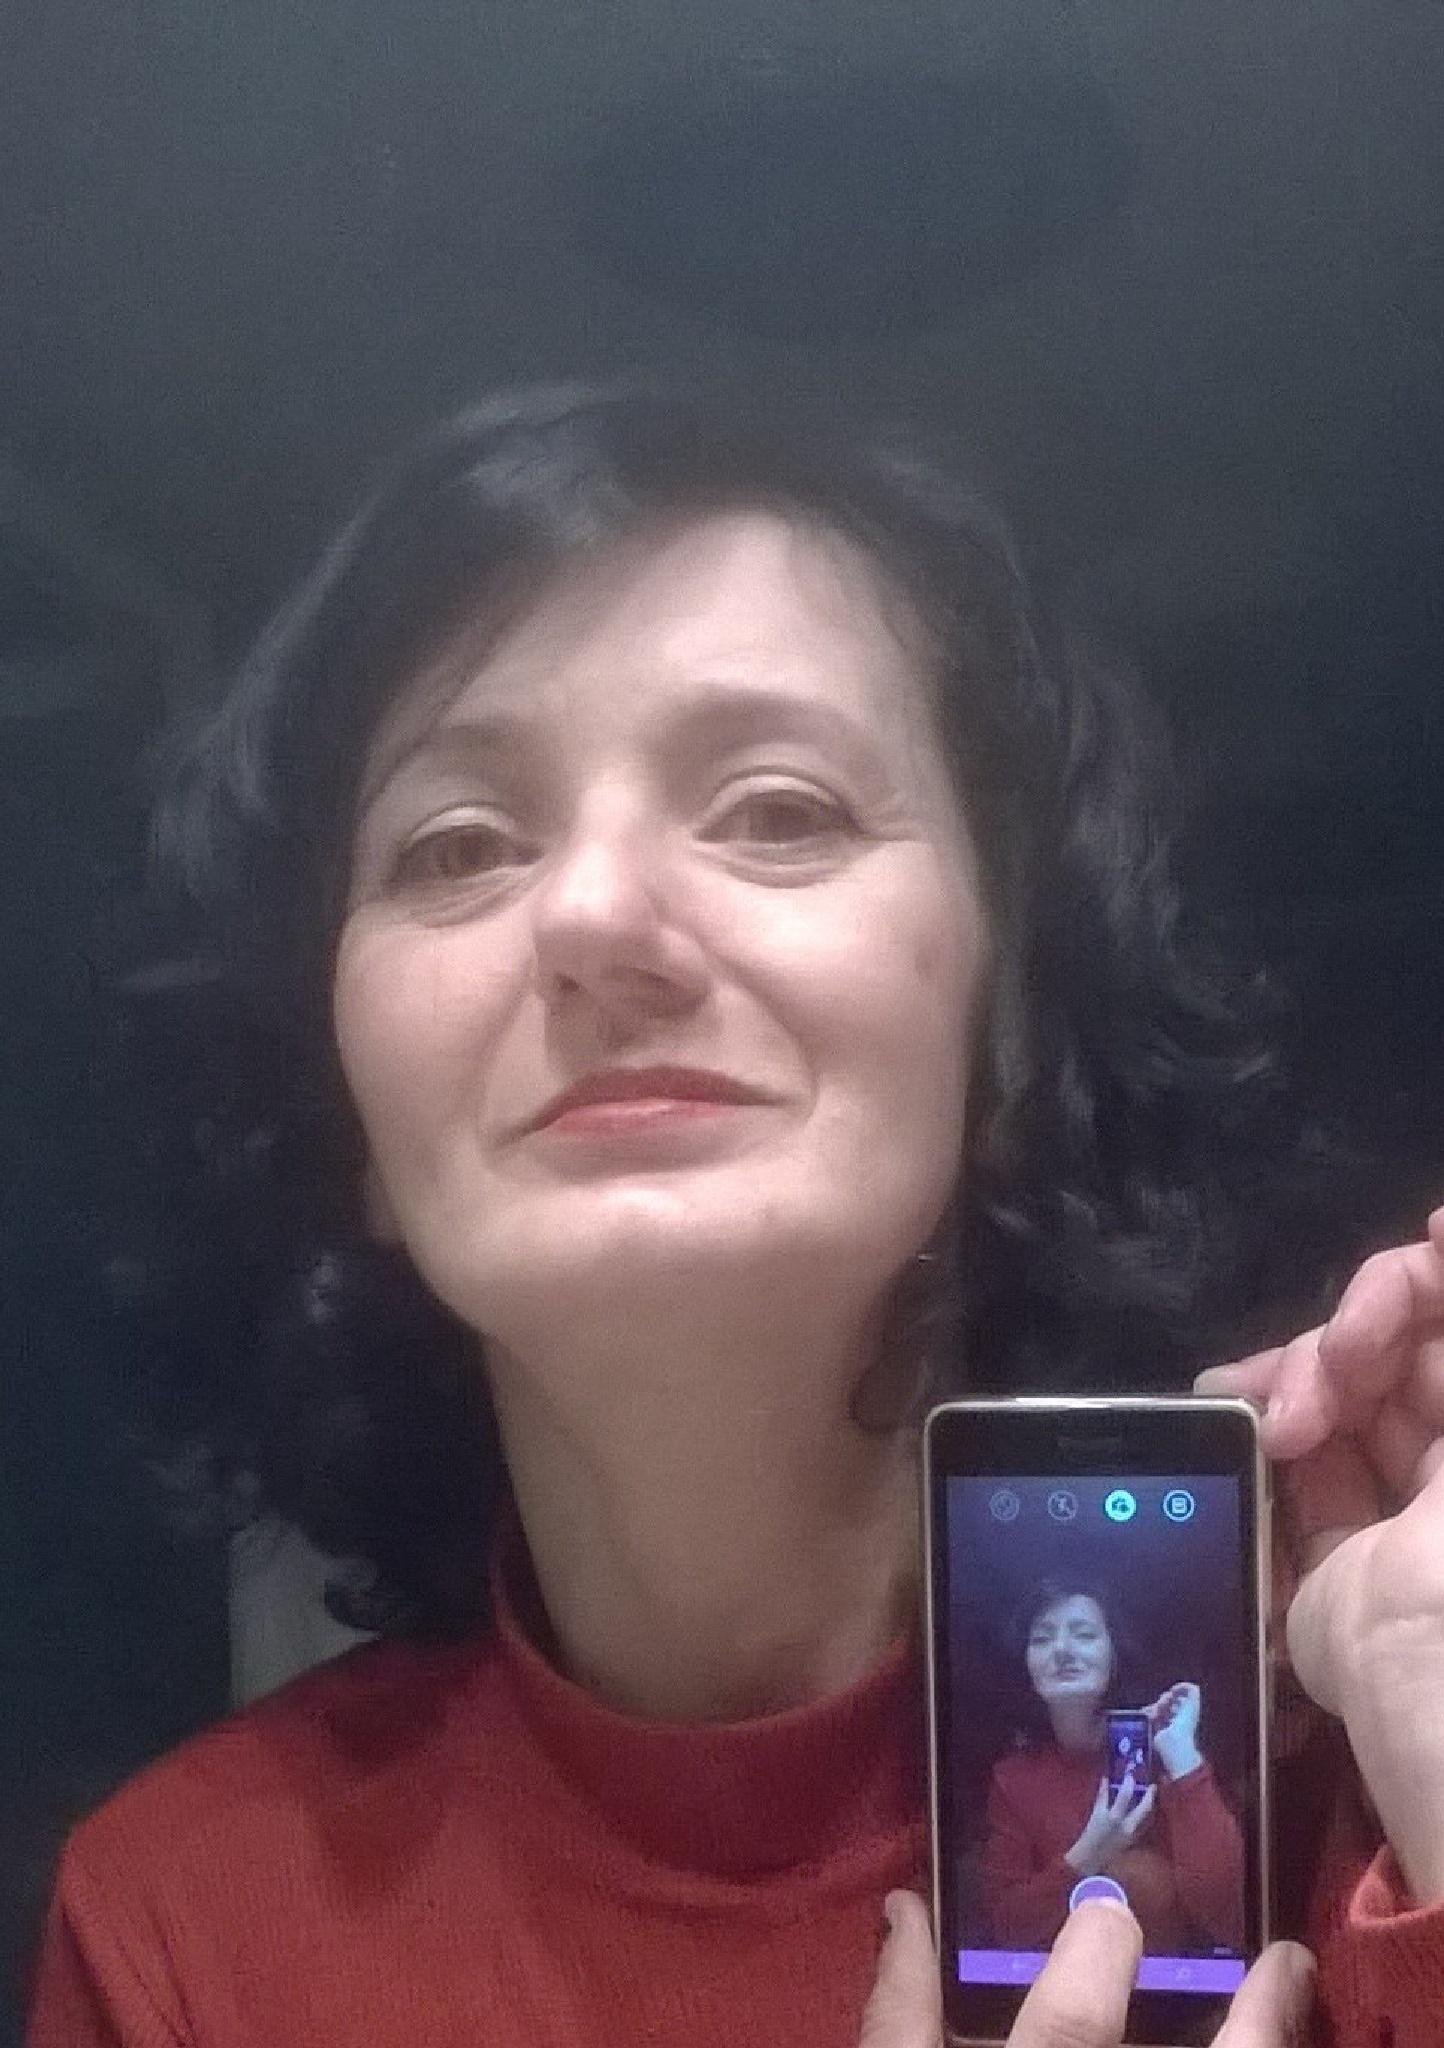 This phone makes me beautiful, I love it !! by Ioana Dumitriu